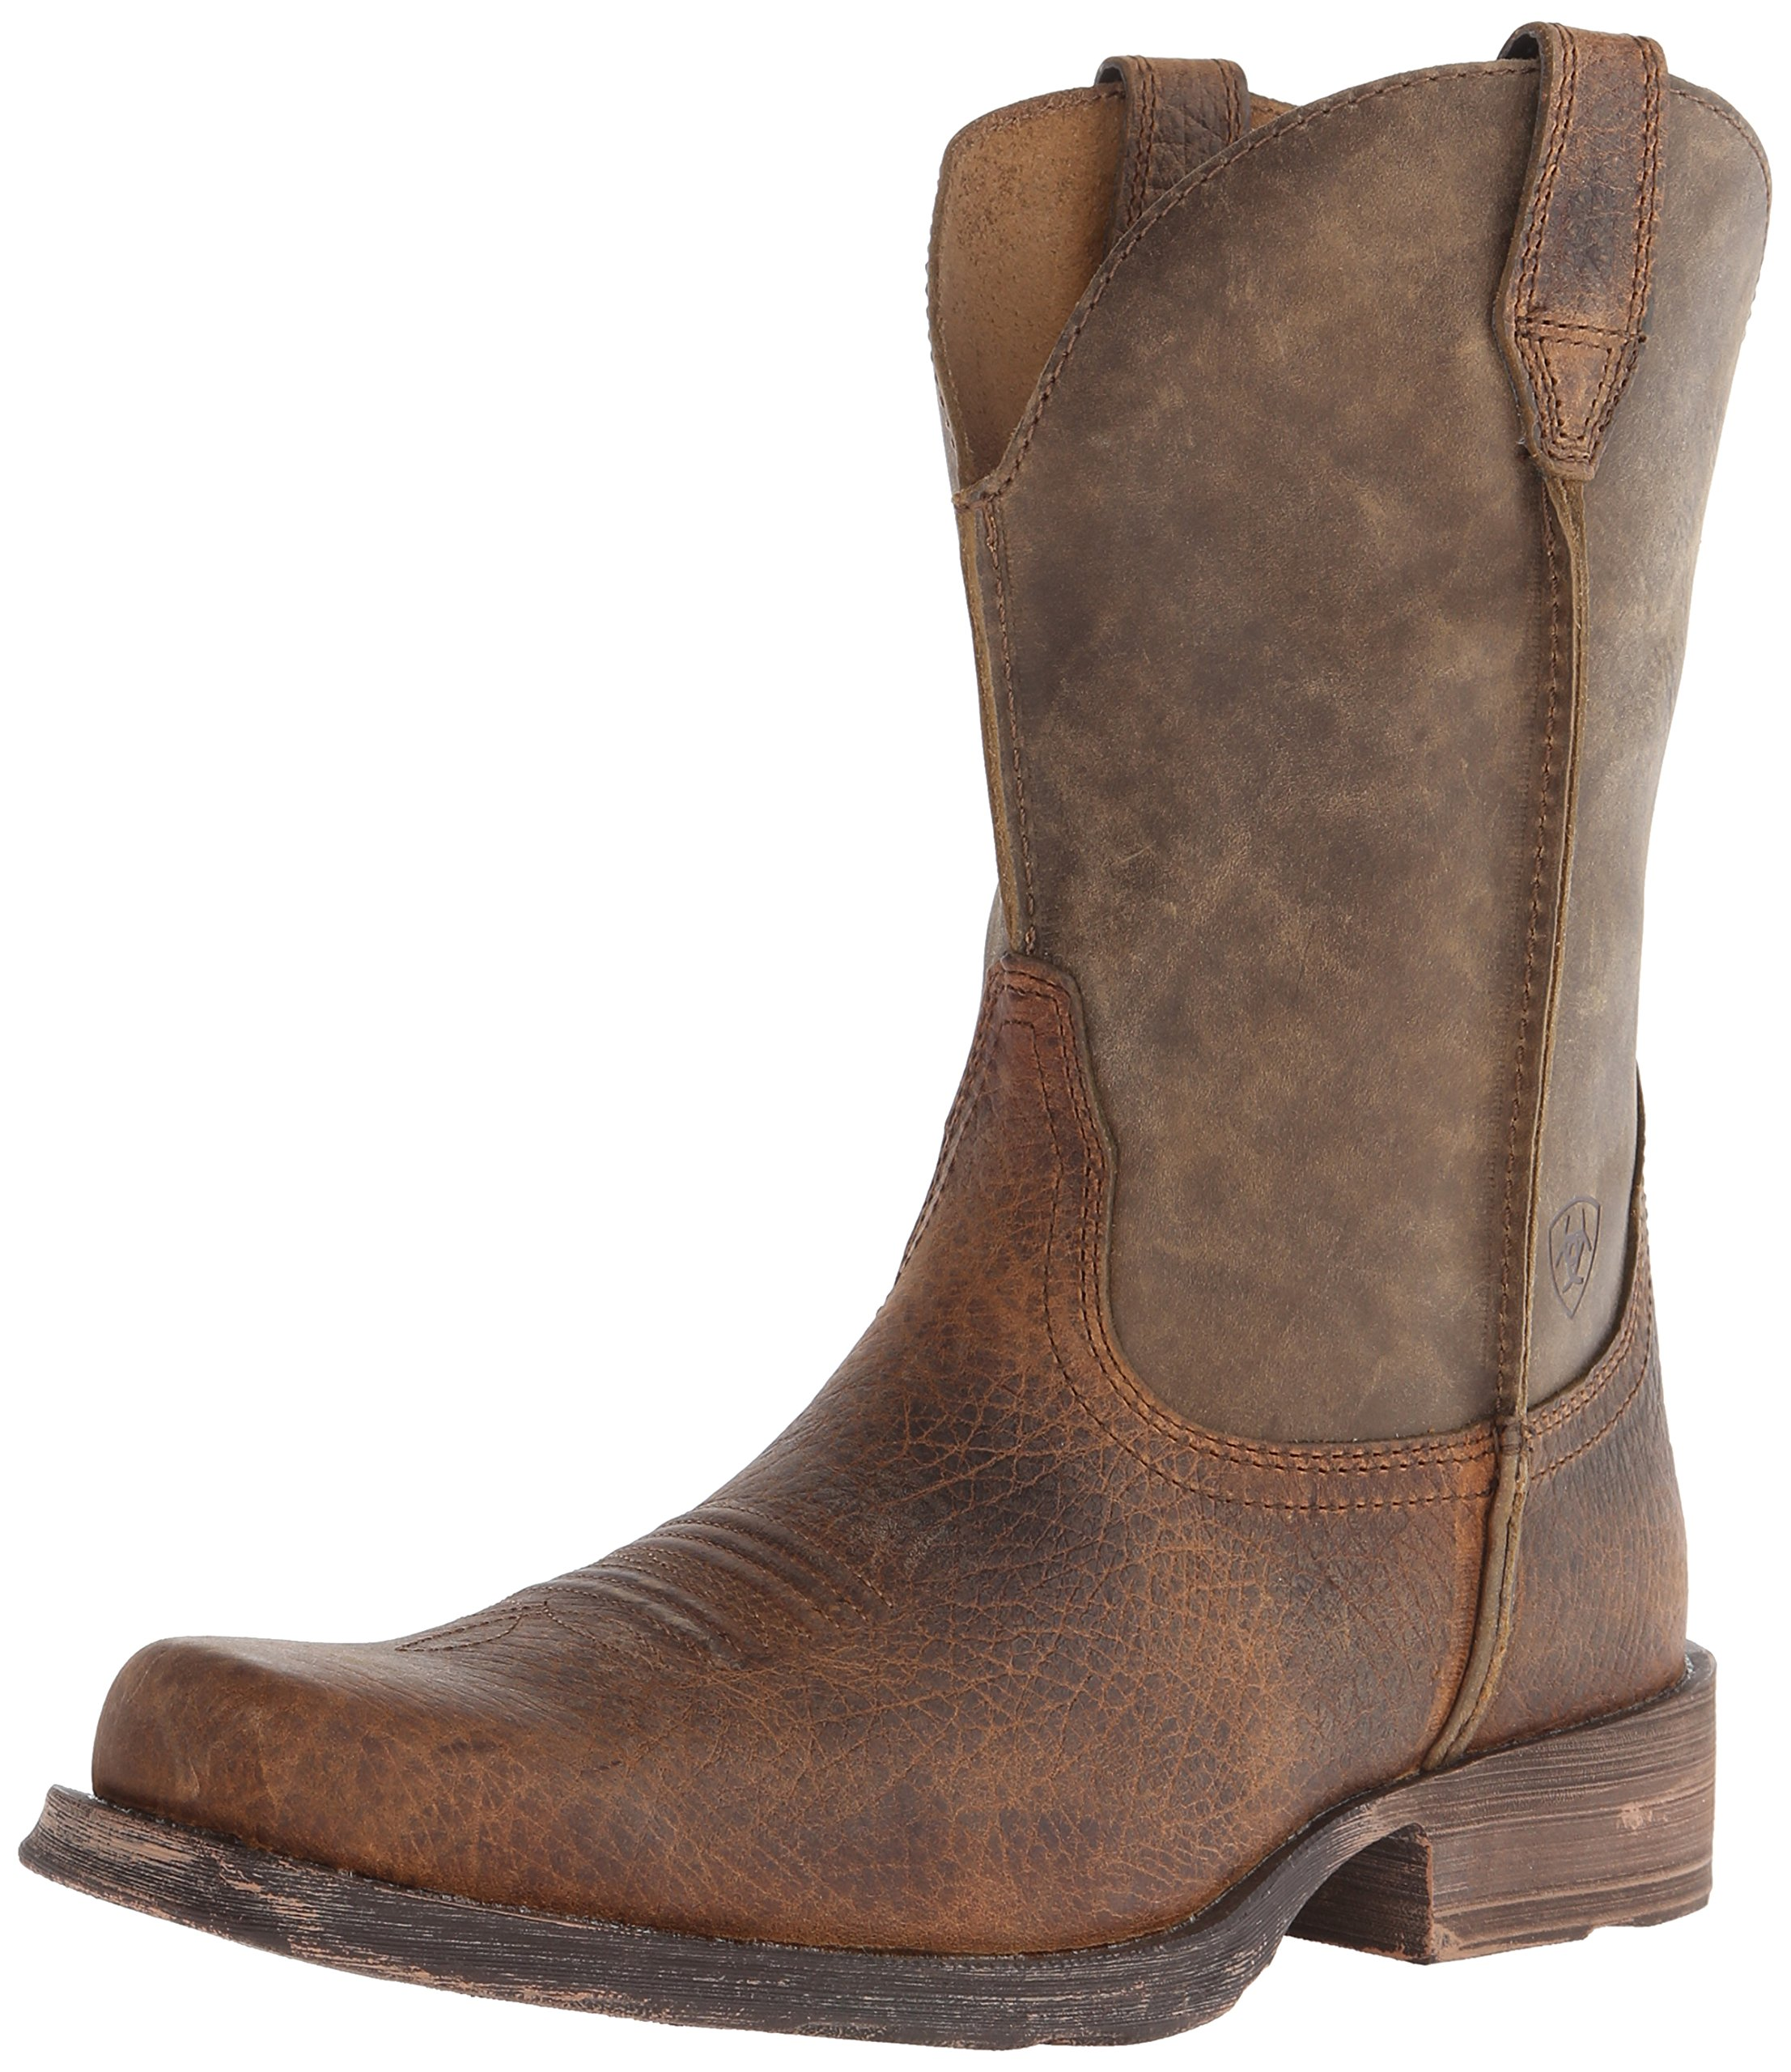 Ariat Men's Rambler Wide Square Toe Western Cowboy Boot, Earth/Brown Bomber, 10 M US